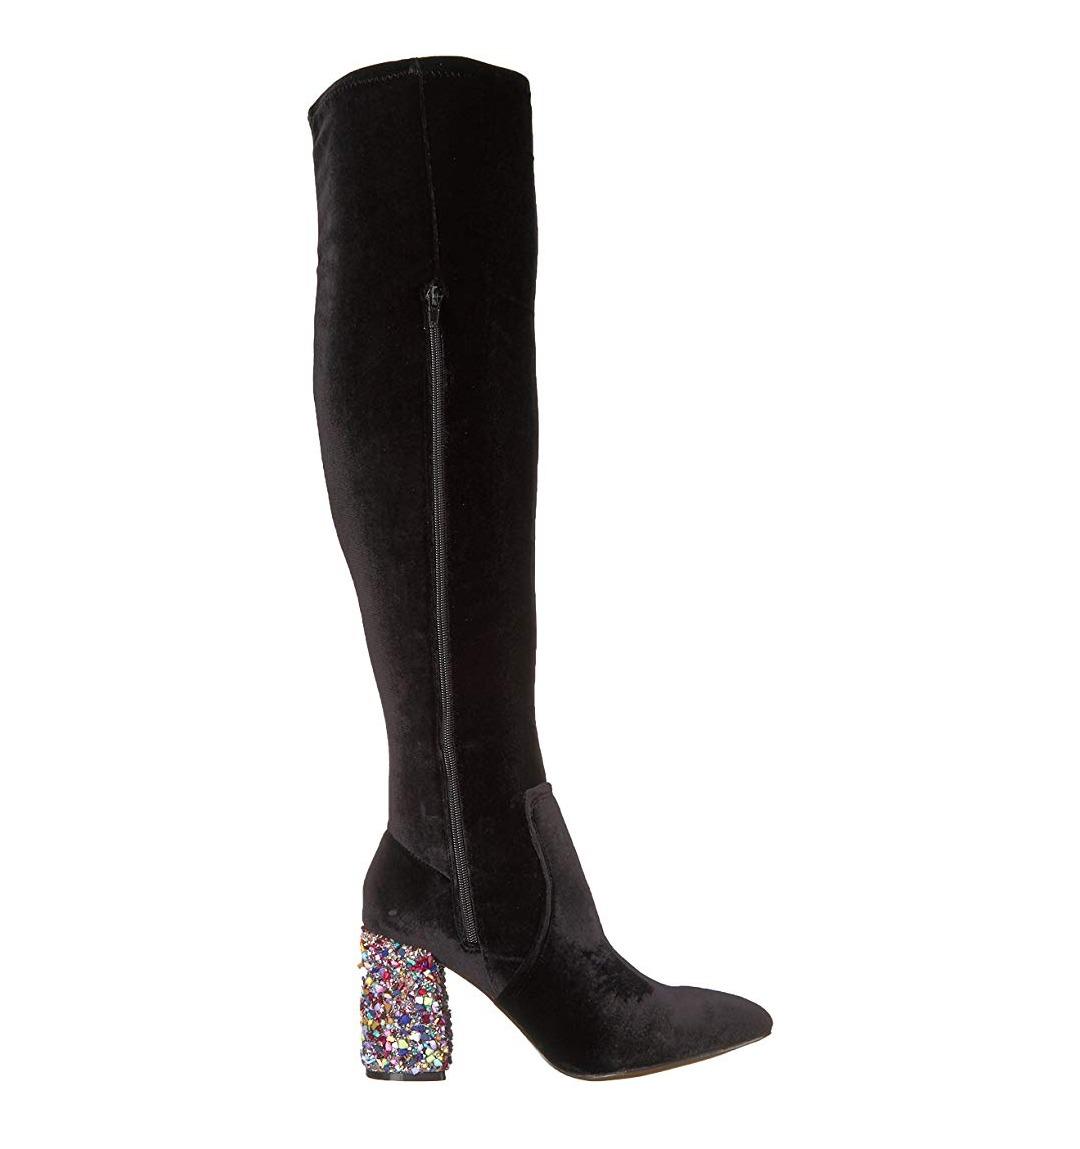 betsey johnson keeva bota holgada para mujertalla 23 cm. Cargando zoom. a5d193b074a81